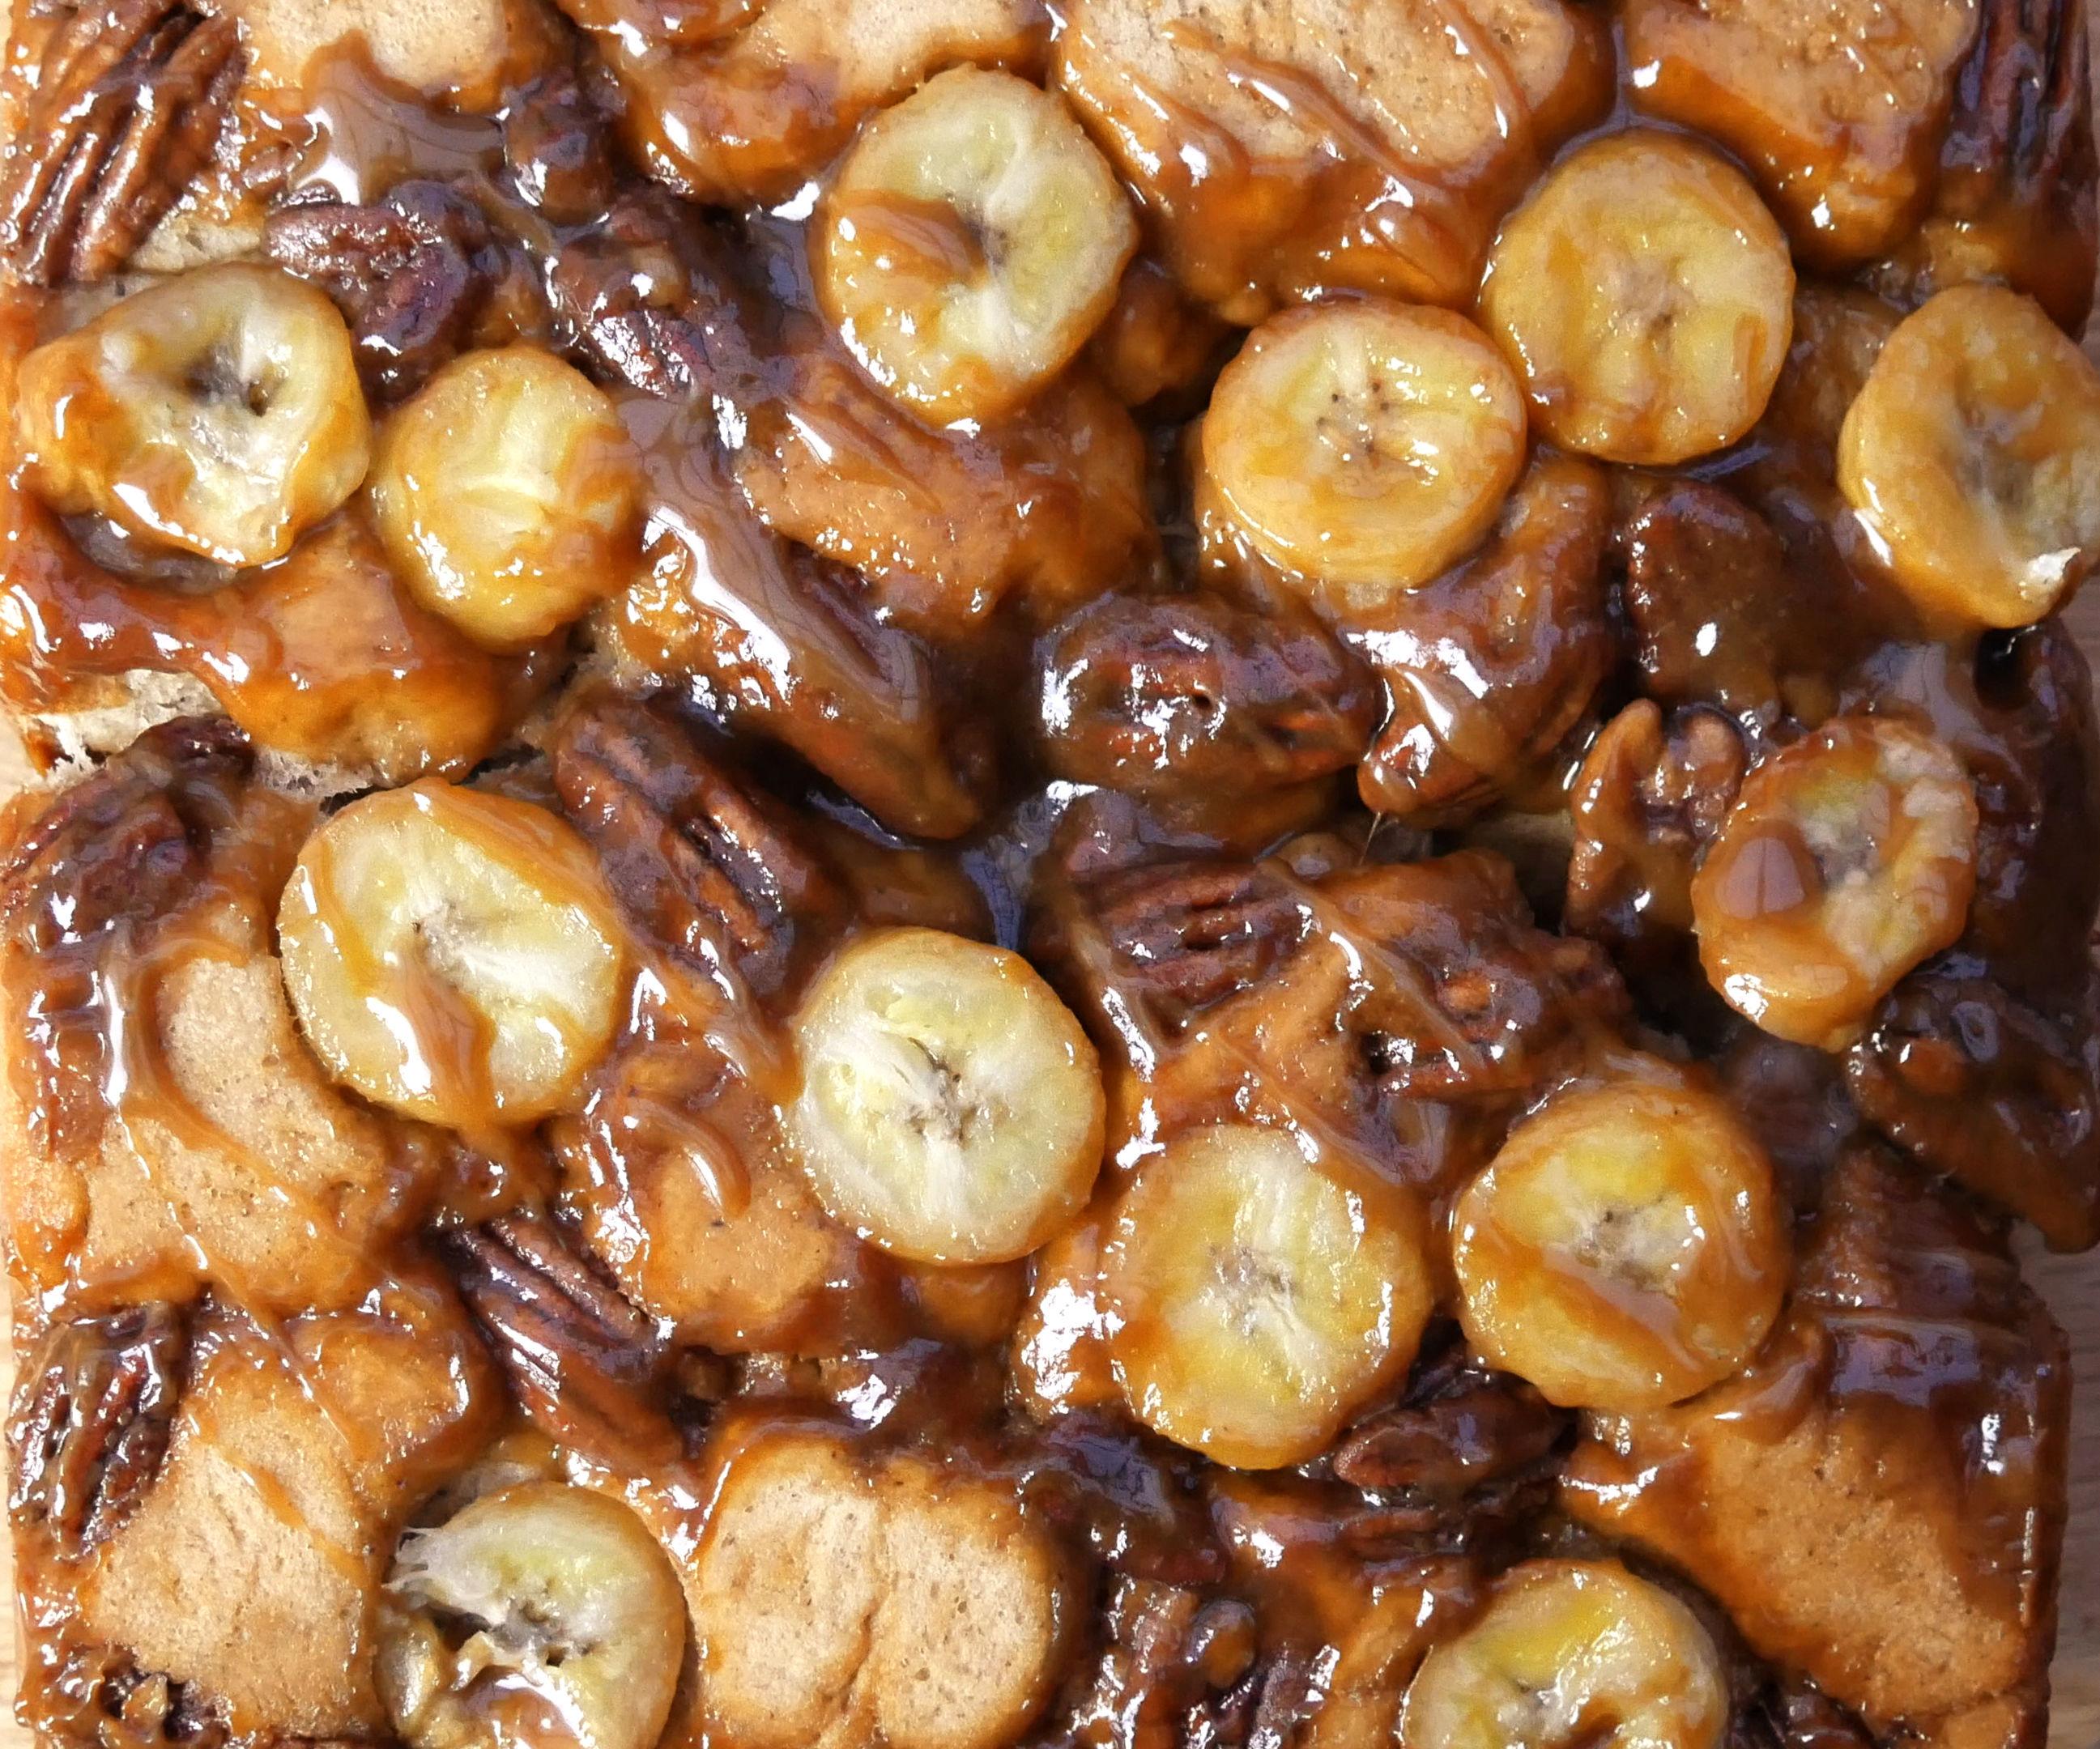 BANOFFEE (BANANA & TOFFEE) PULL-APART BREAD